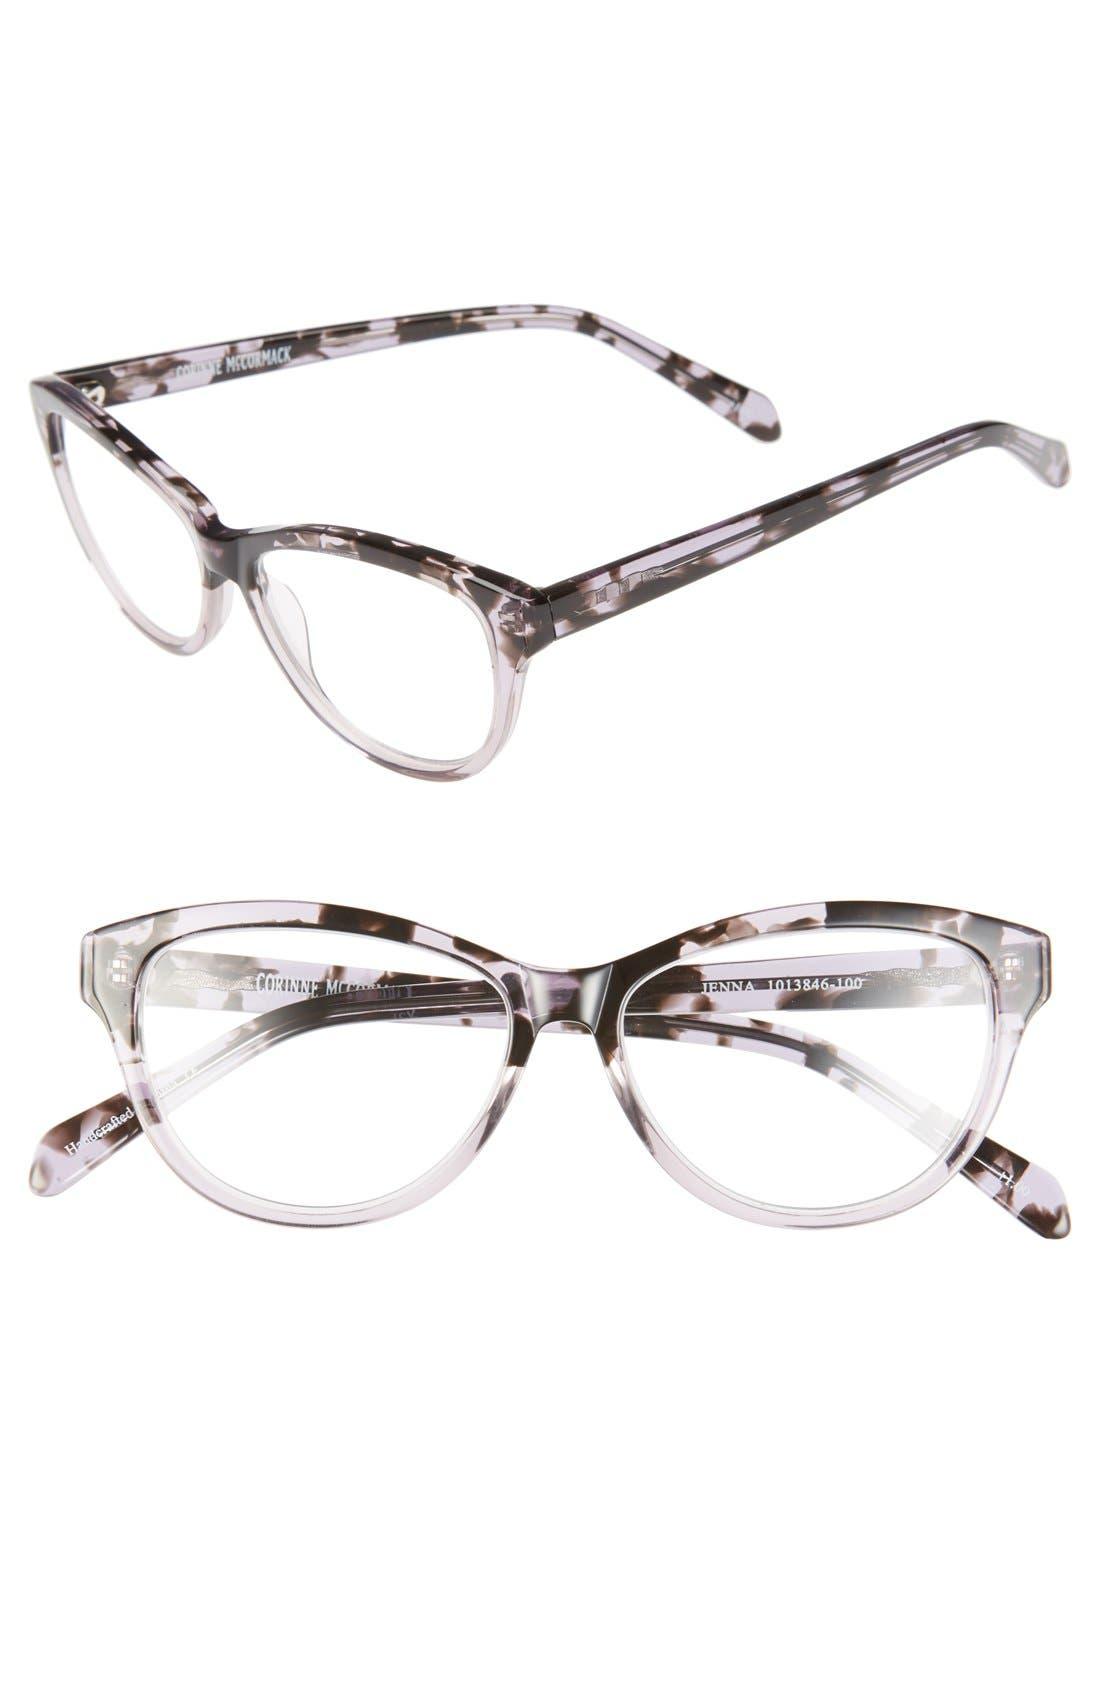 Main Image - Corinne McCormack 'Jenna' 50mm Reading Glasses